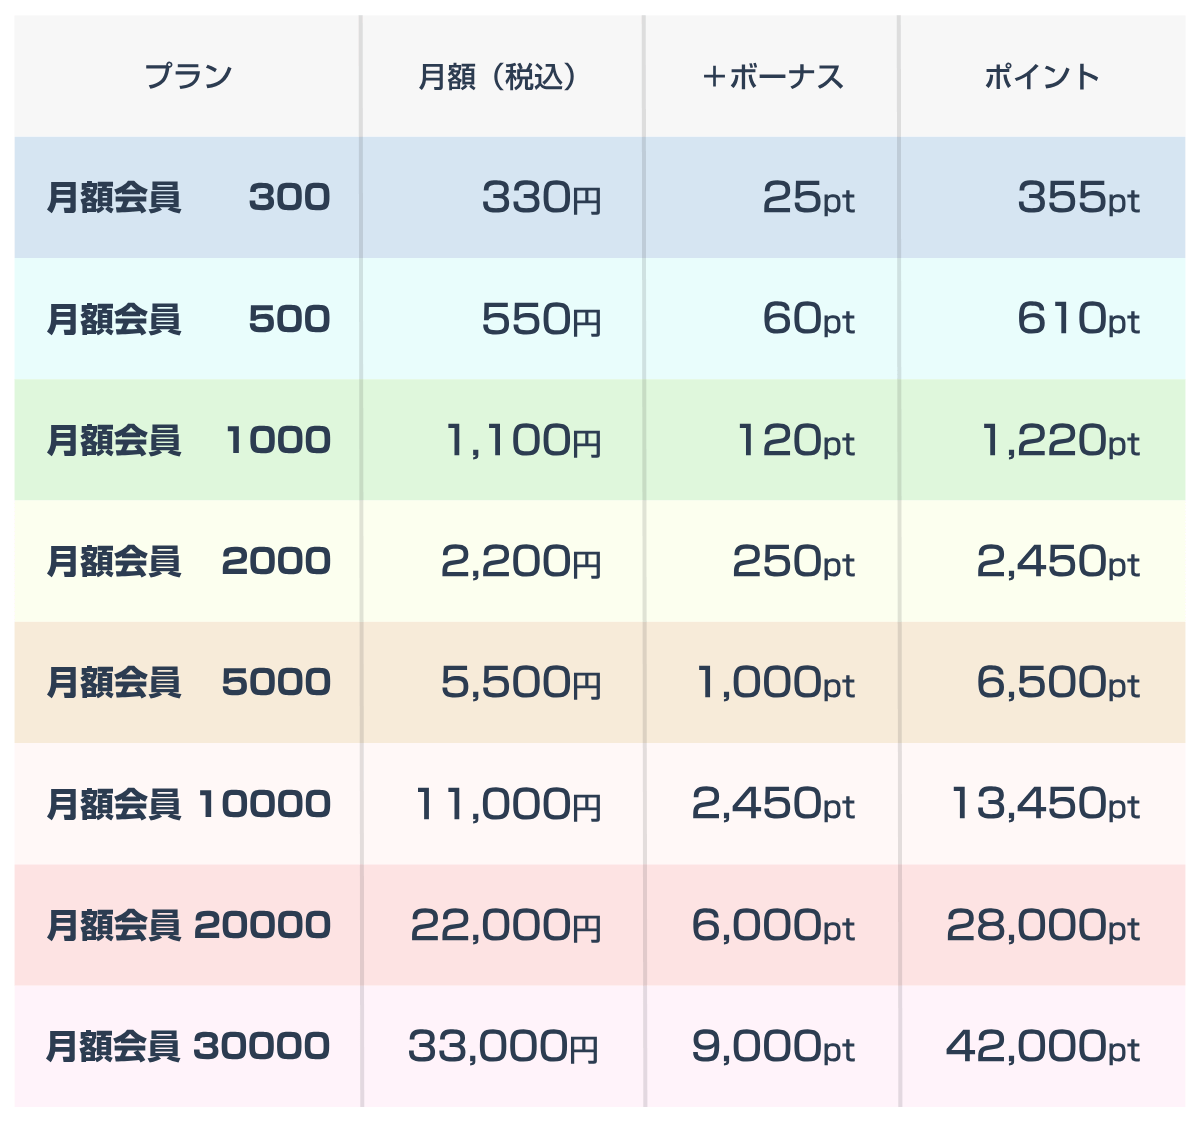 『audiobook.jp』月額会員の料金一覧